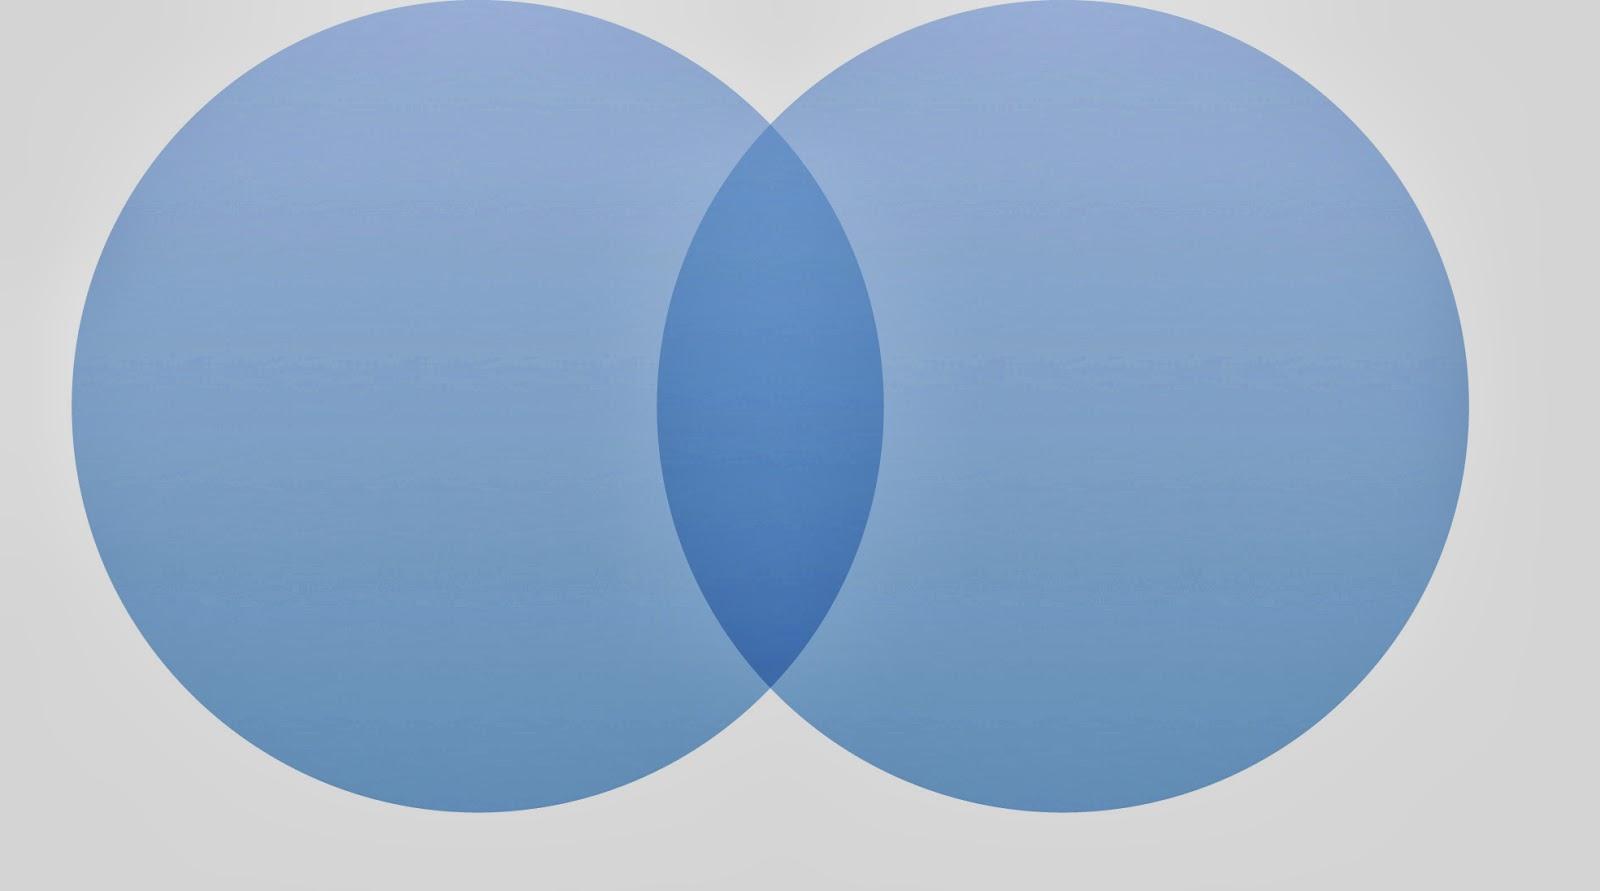 Parsha Math: Shmini- Venn Diagrams